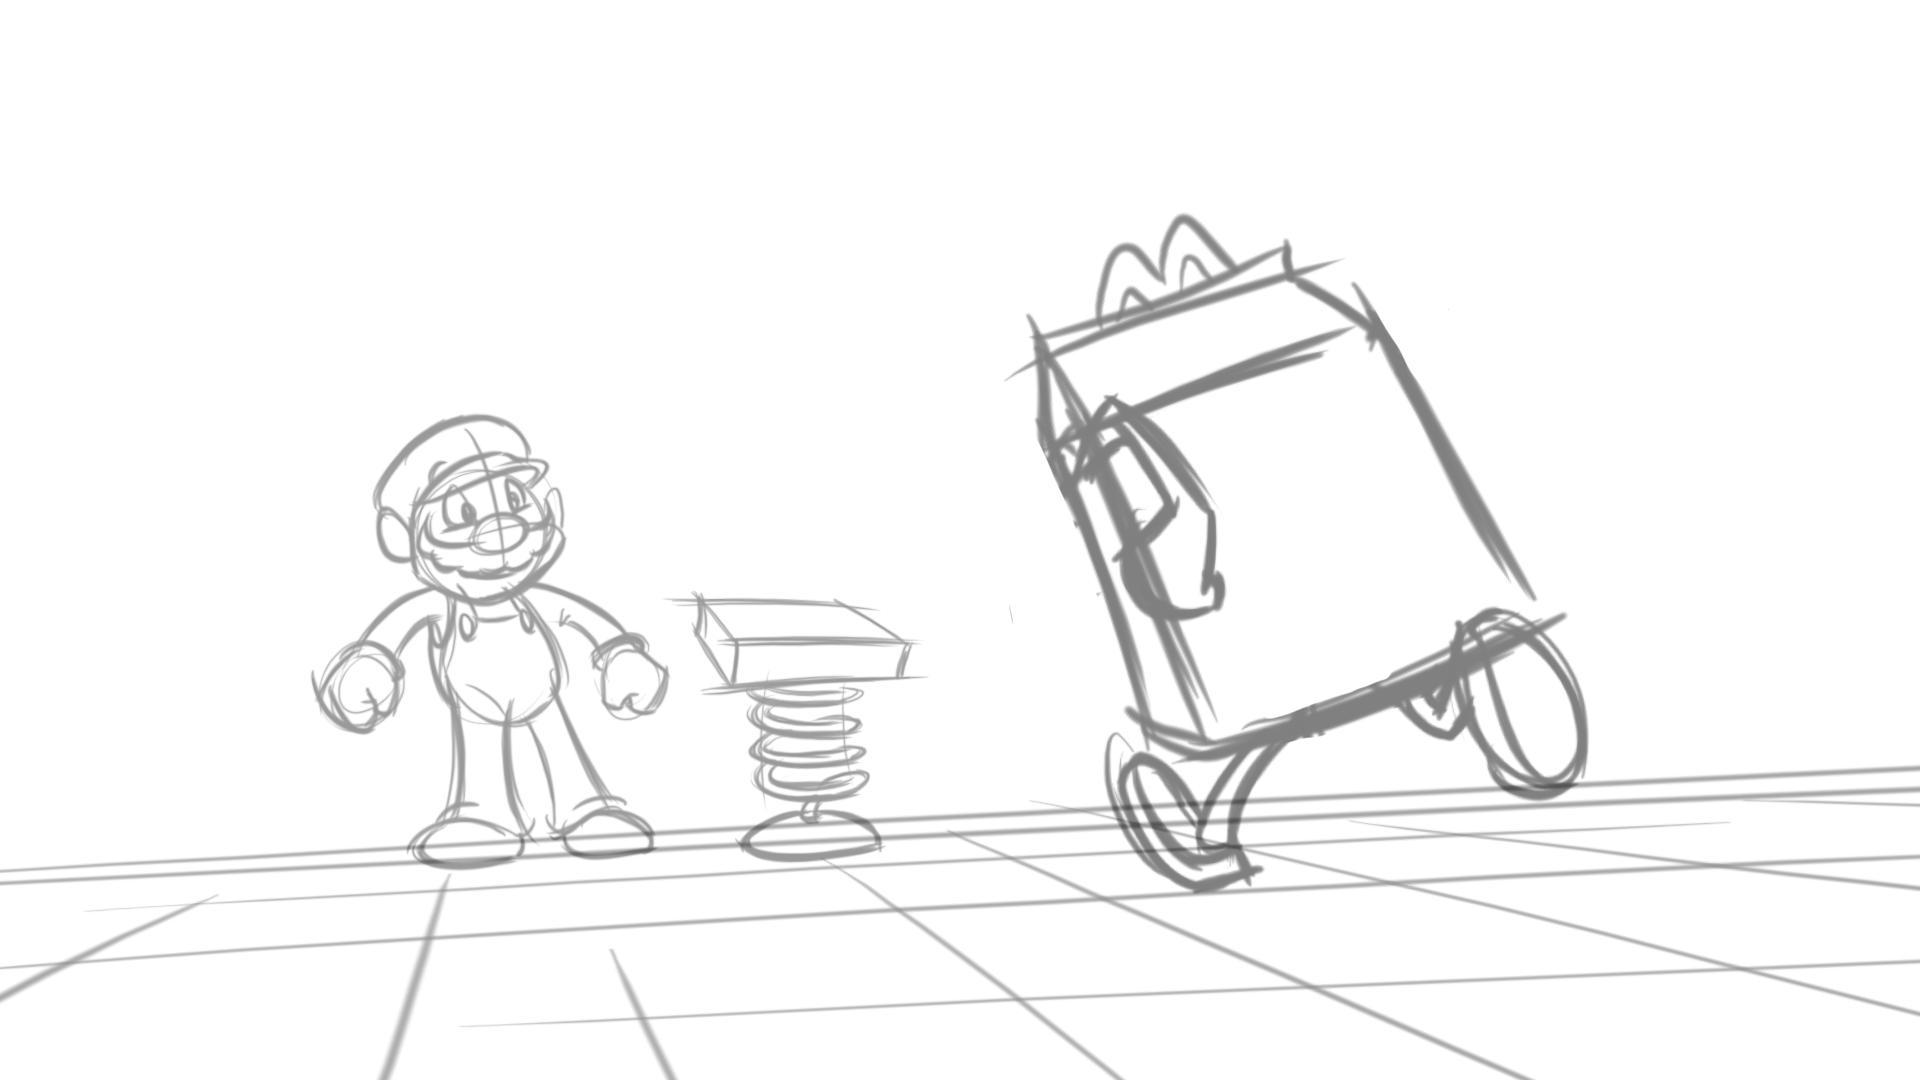 Mario-07-07.jpg